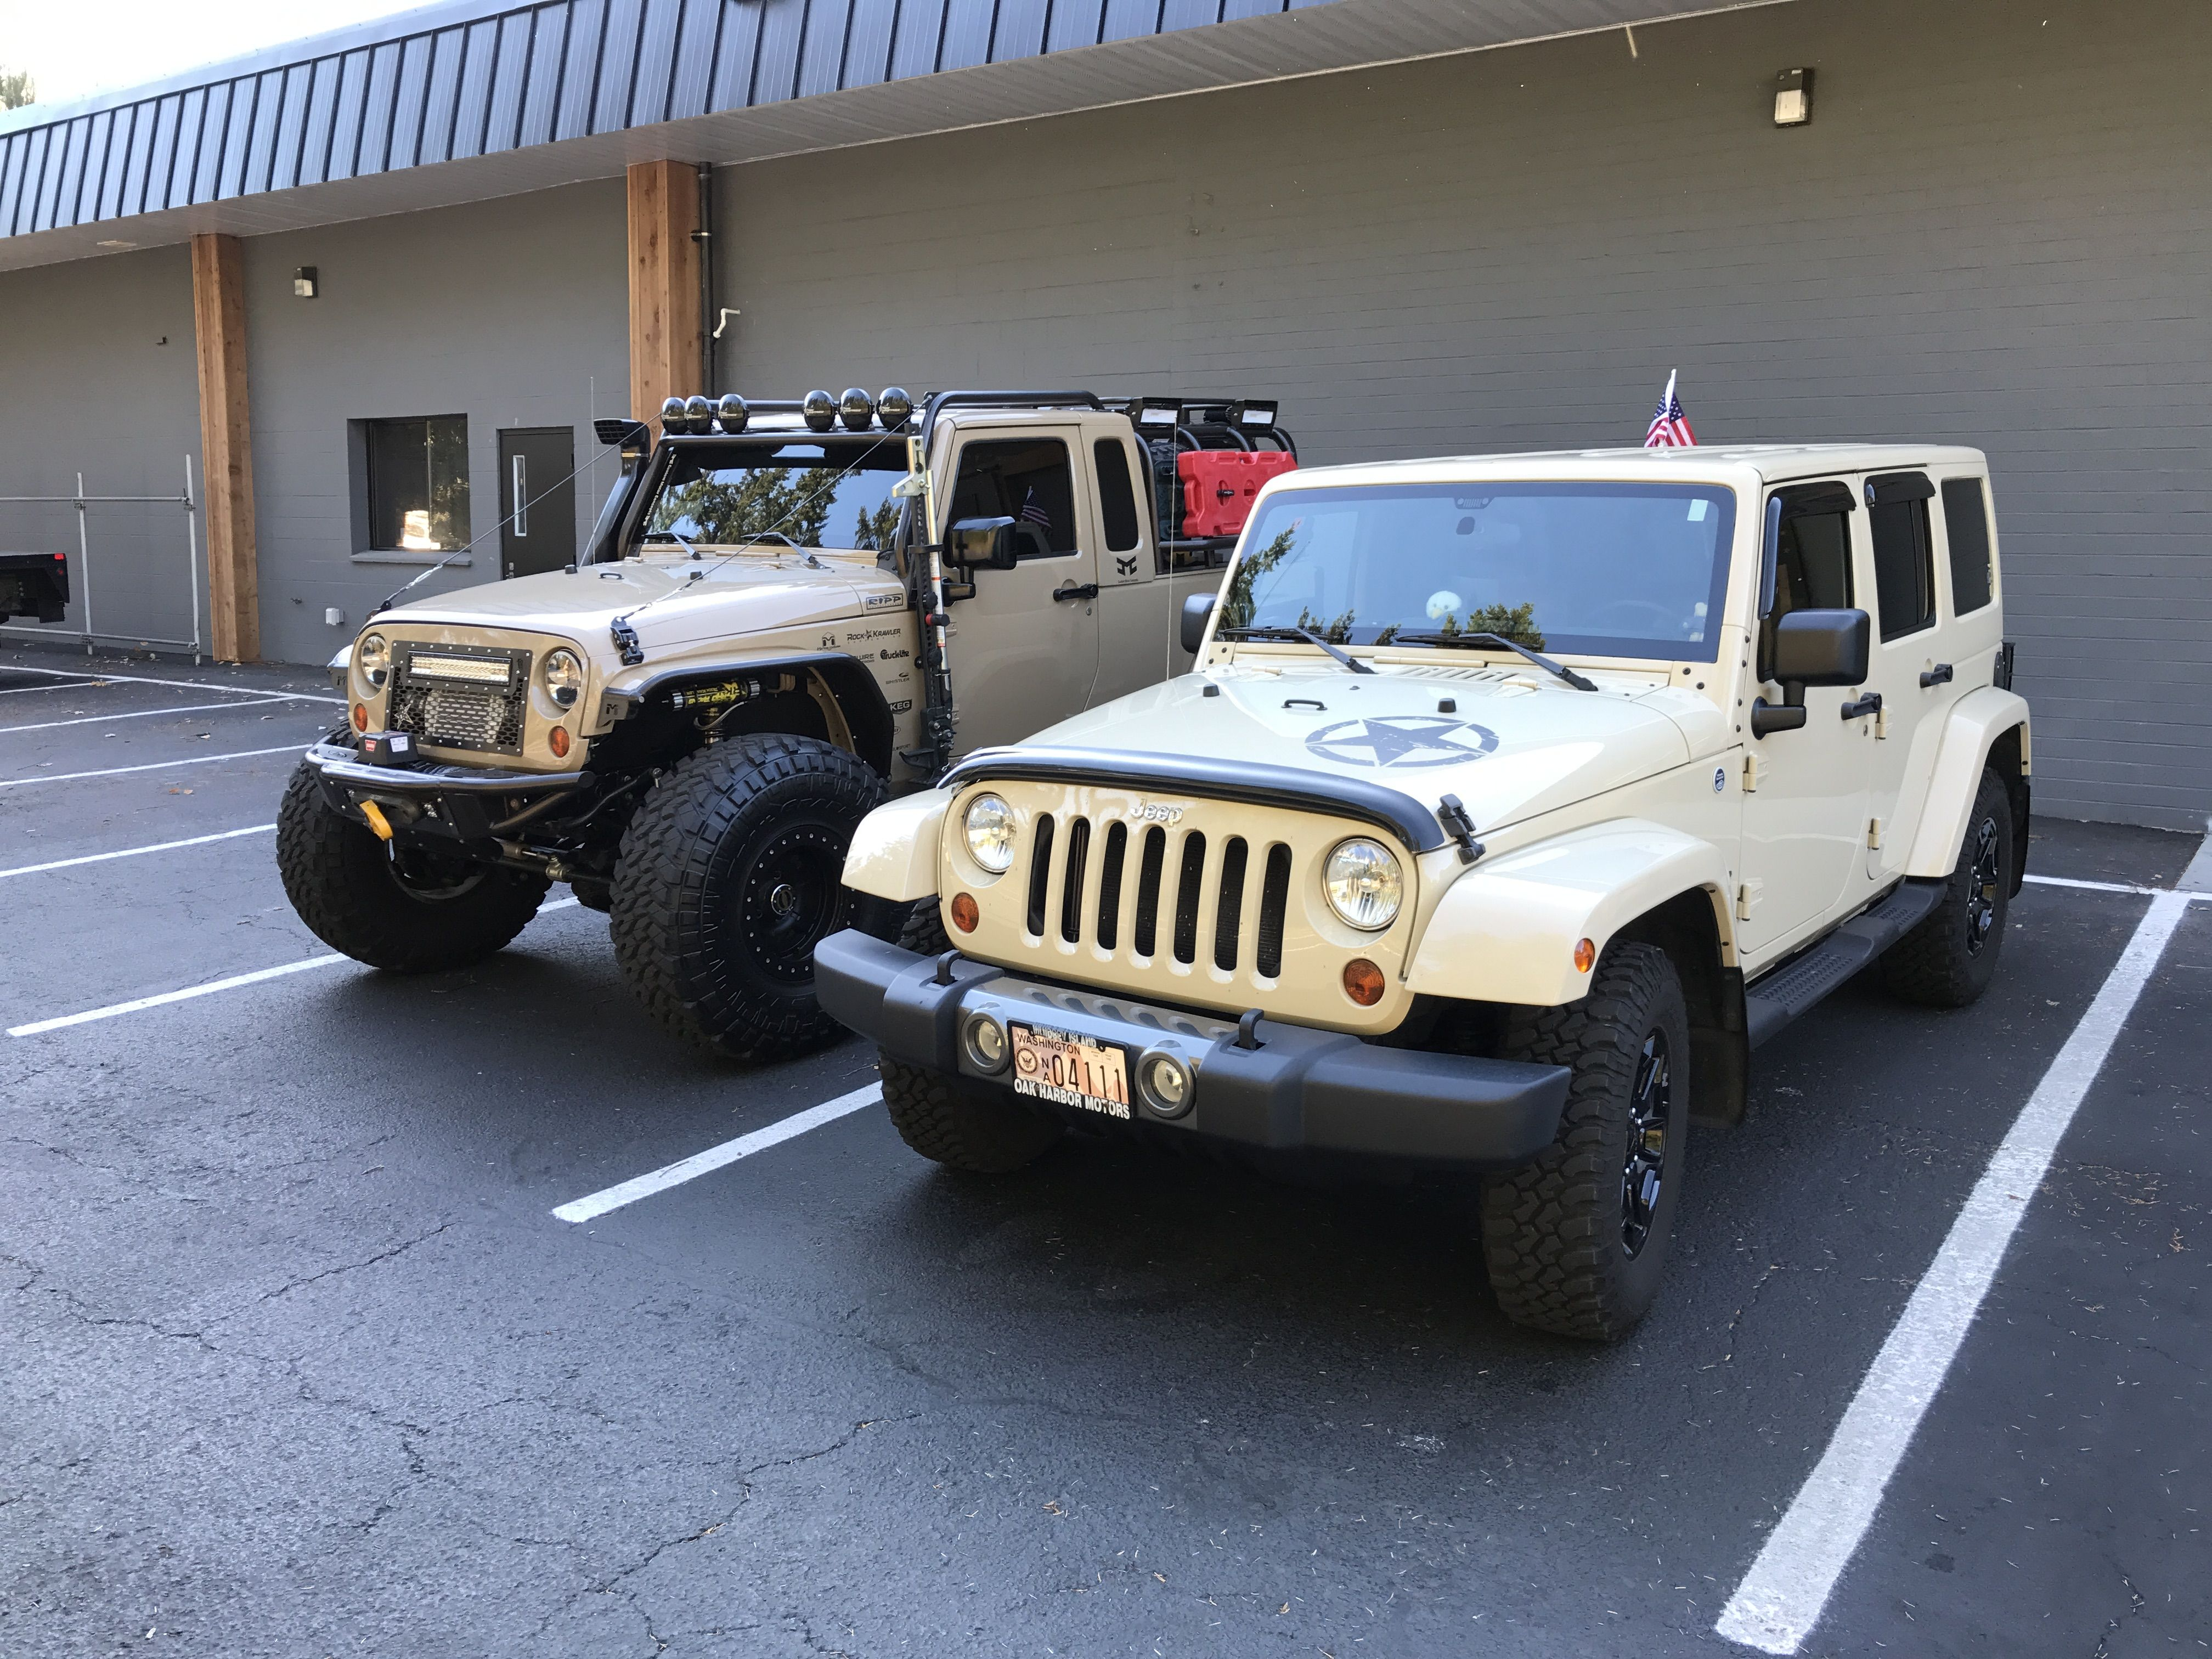 "PRIM8TE"" 2011 JK8 My 2011 Jeep JK8 ""PRIM8TE"" Pinterest"